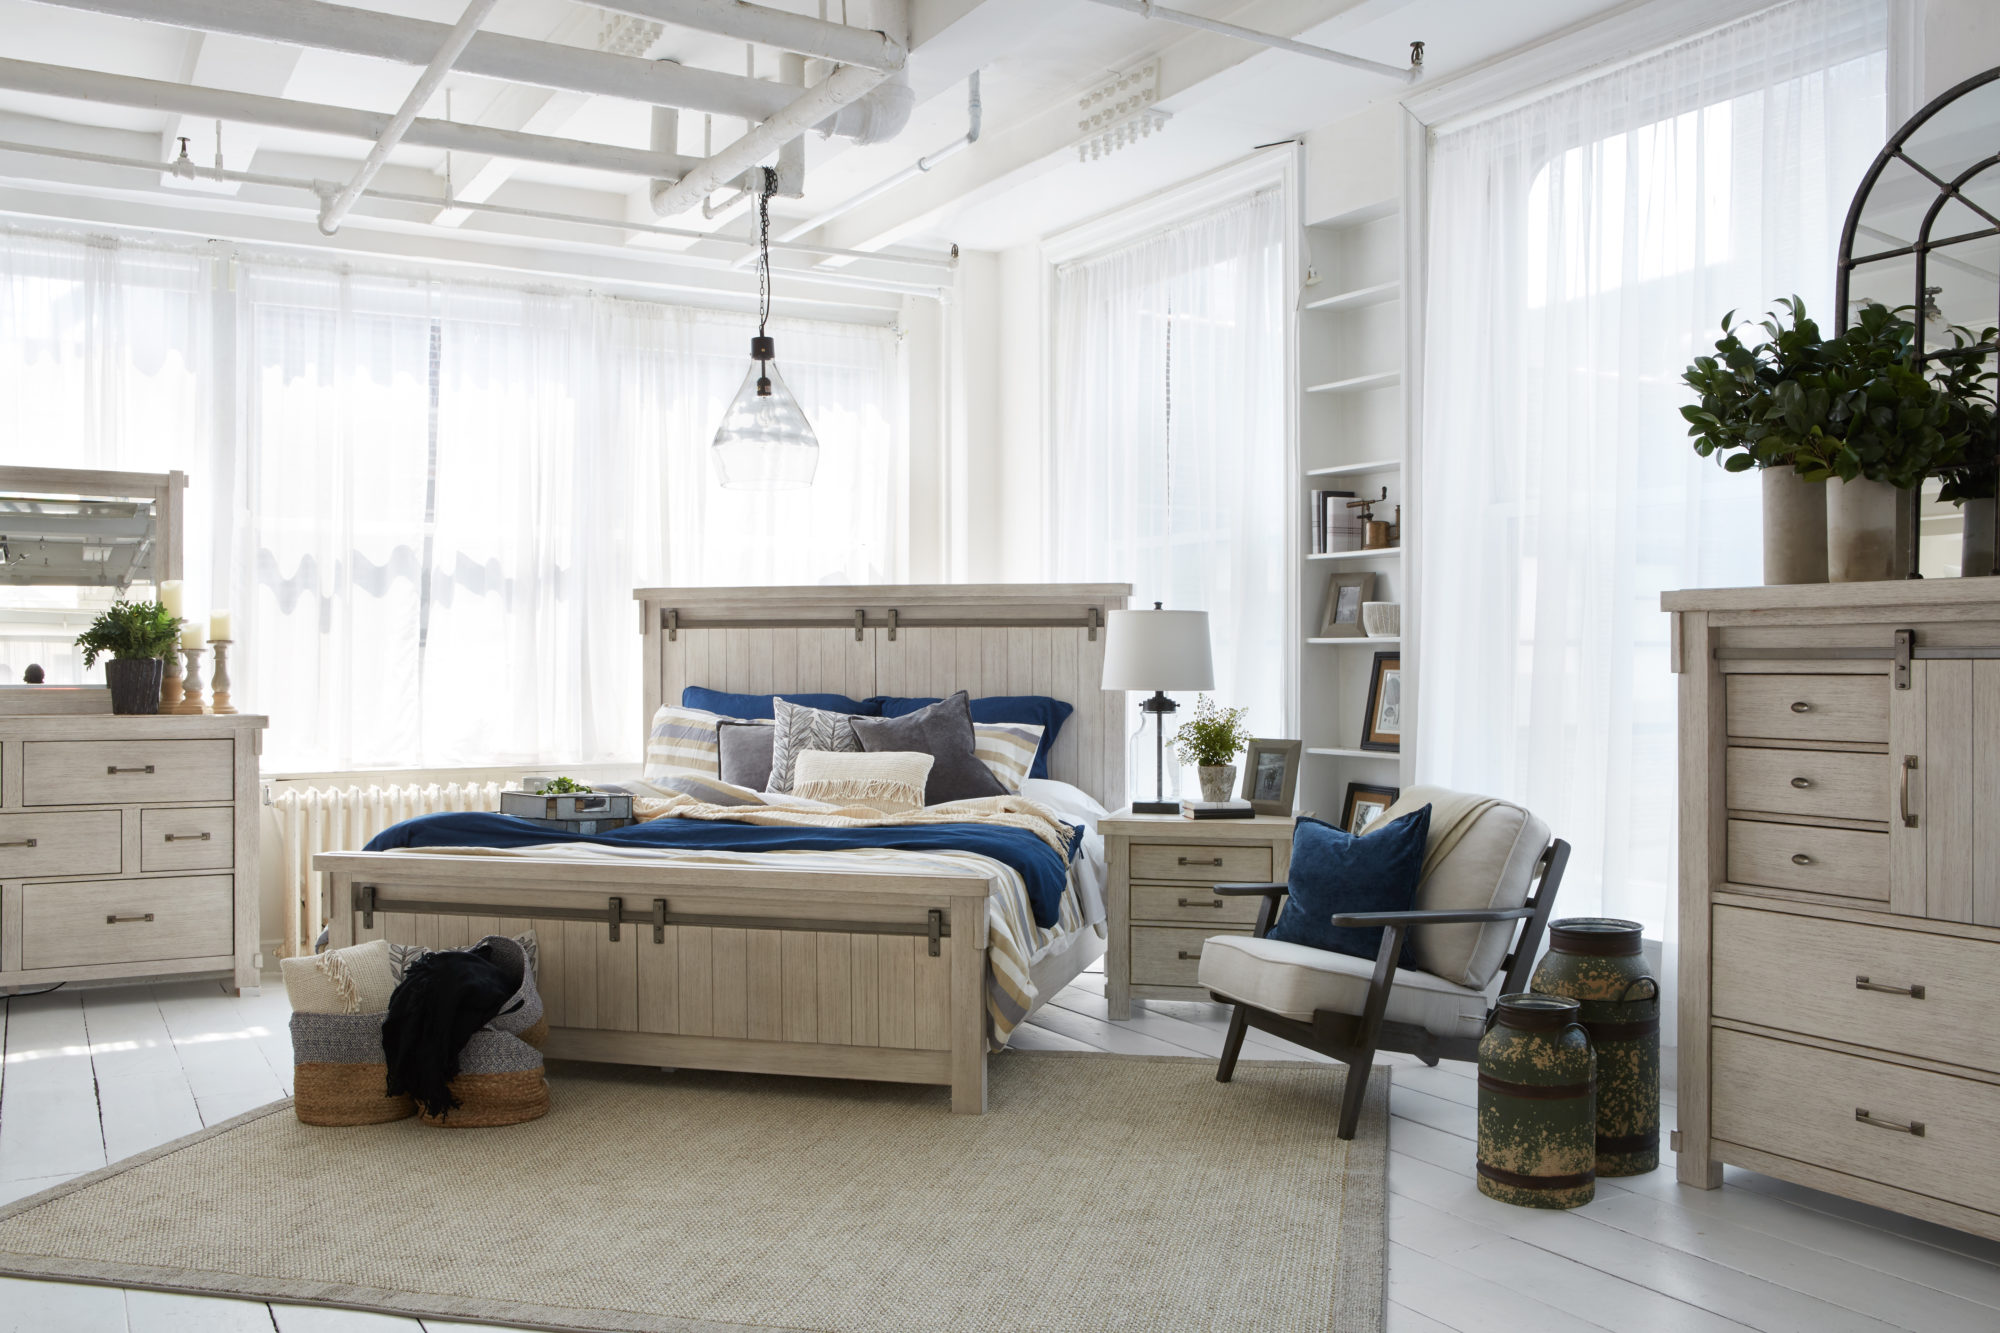 Ashley Homestore S New Modern Farmhouse Furniture Line Mane Mason